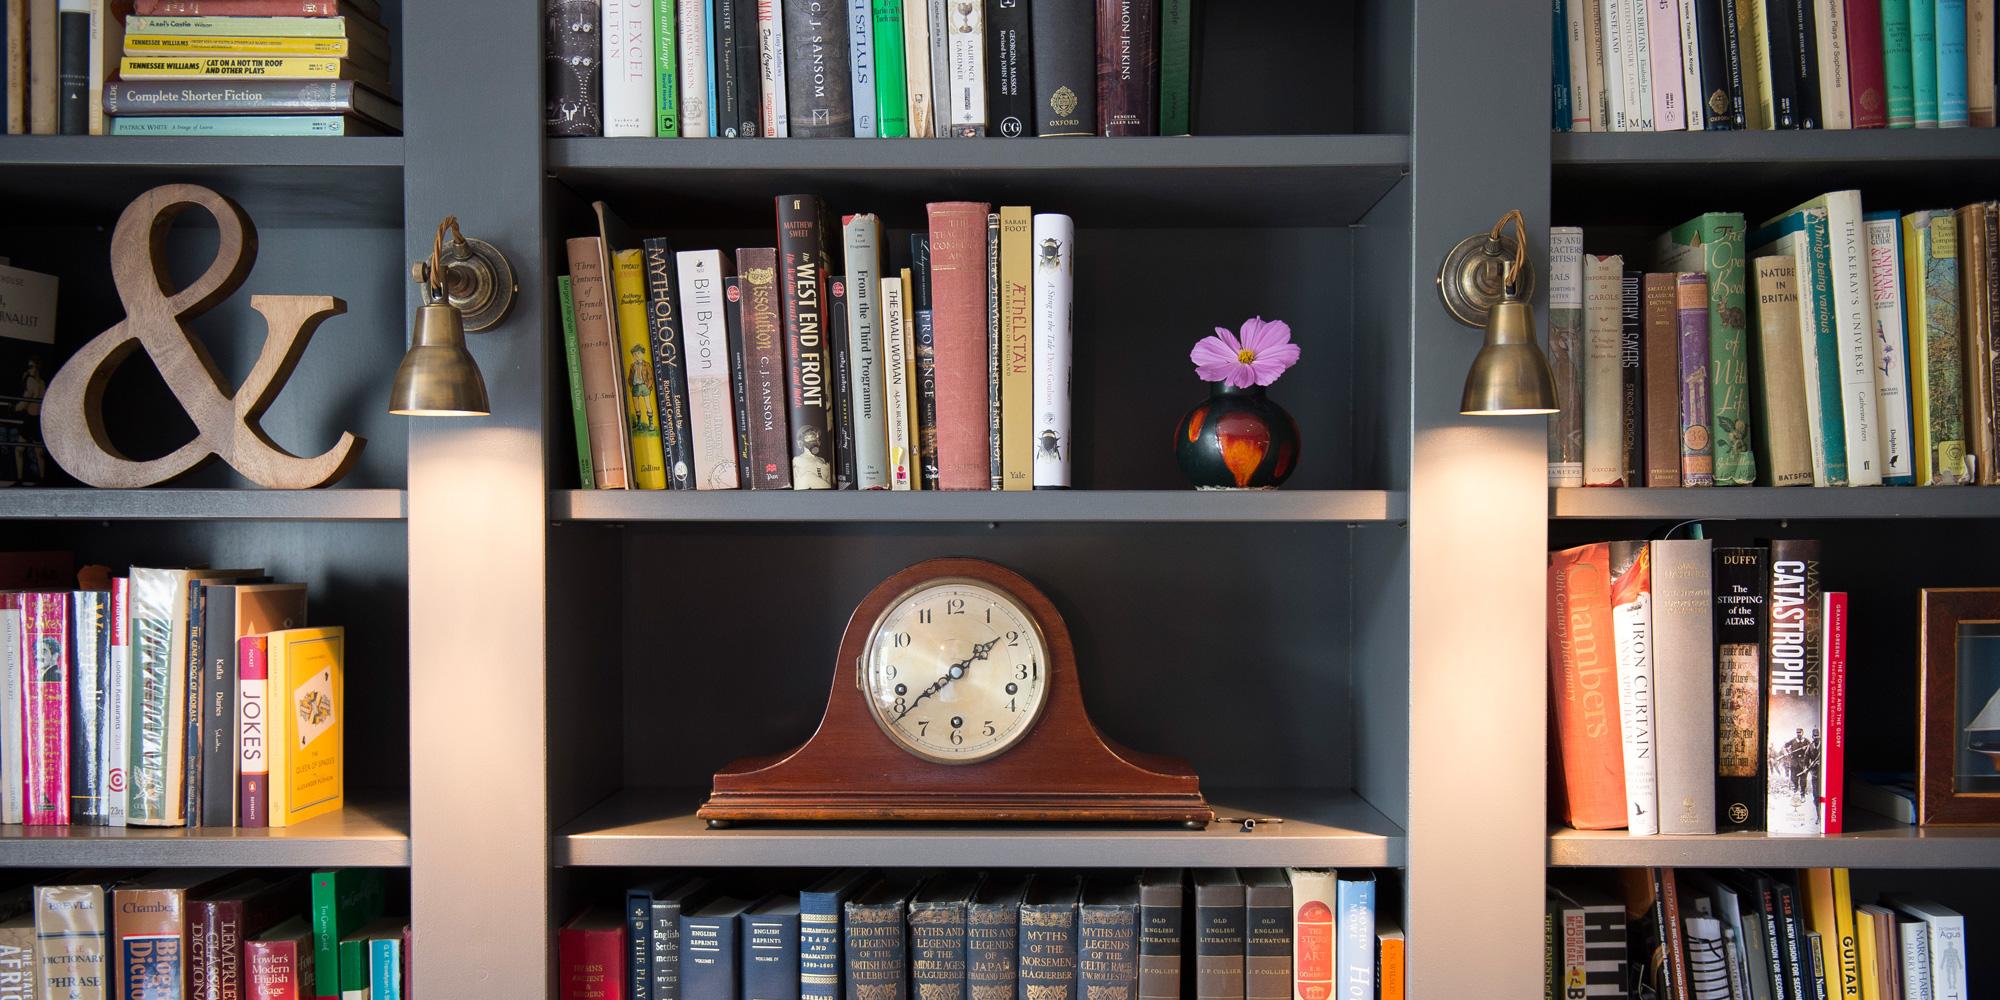 5-nikki-rees-interior-styling-interior-design-wimbledon-london-surrey